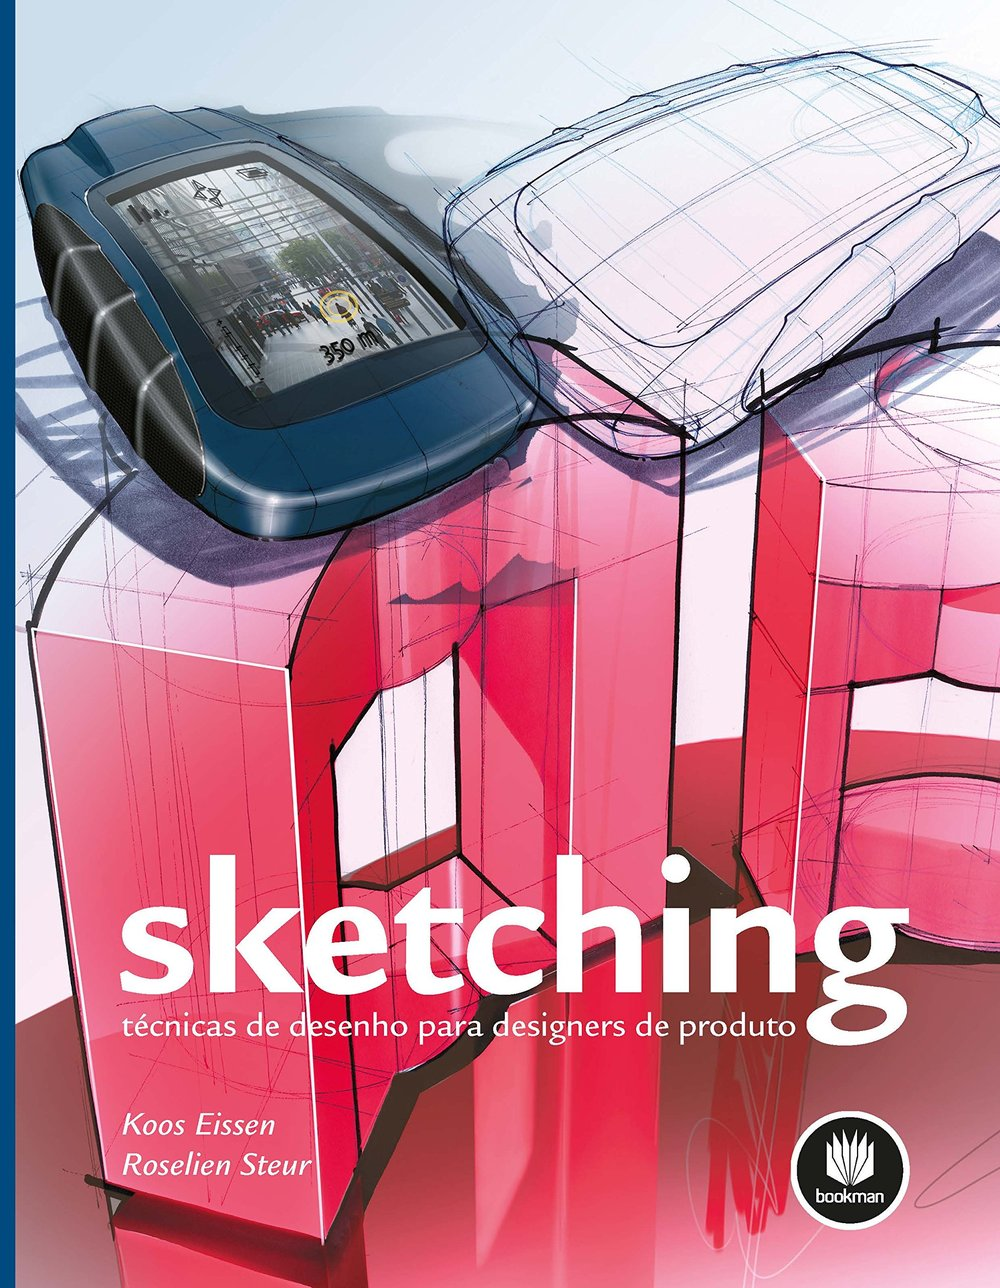 tr8-sketching-técnicas-de-desenho-eissen-steur.jpg